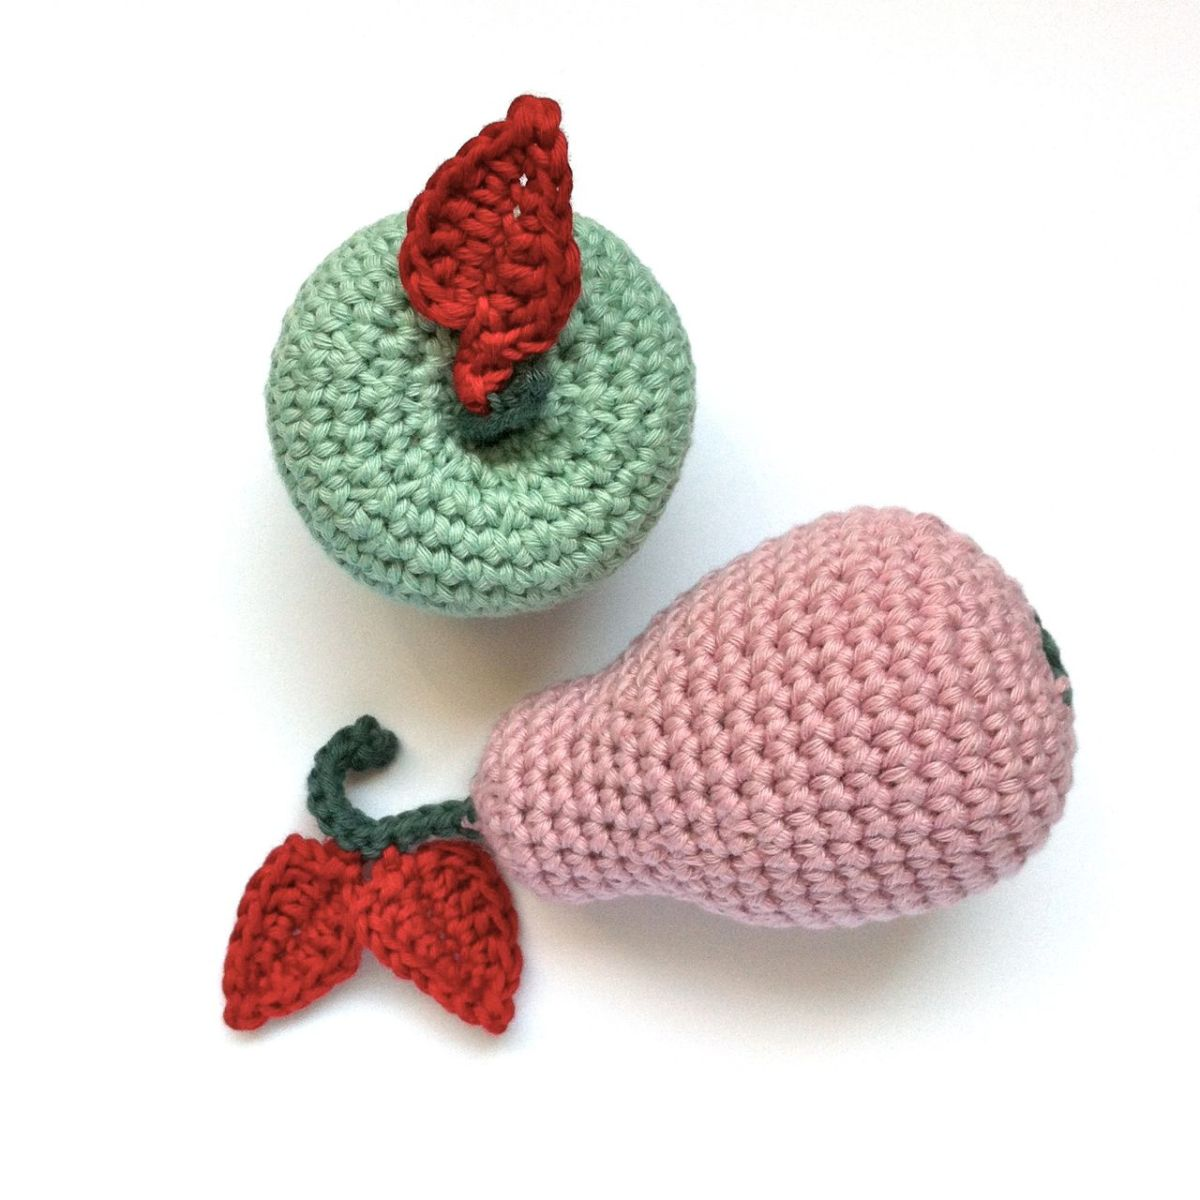 Cath Kidston Crocheted Fruit